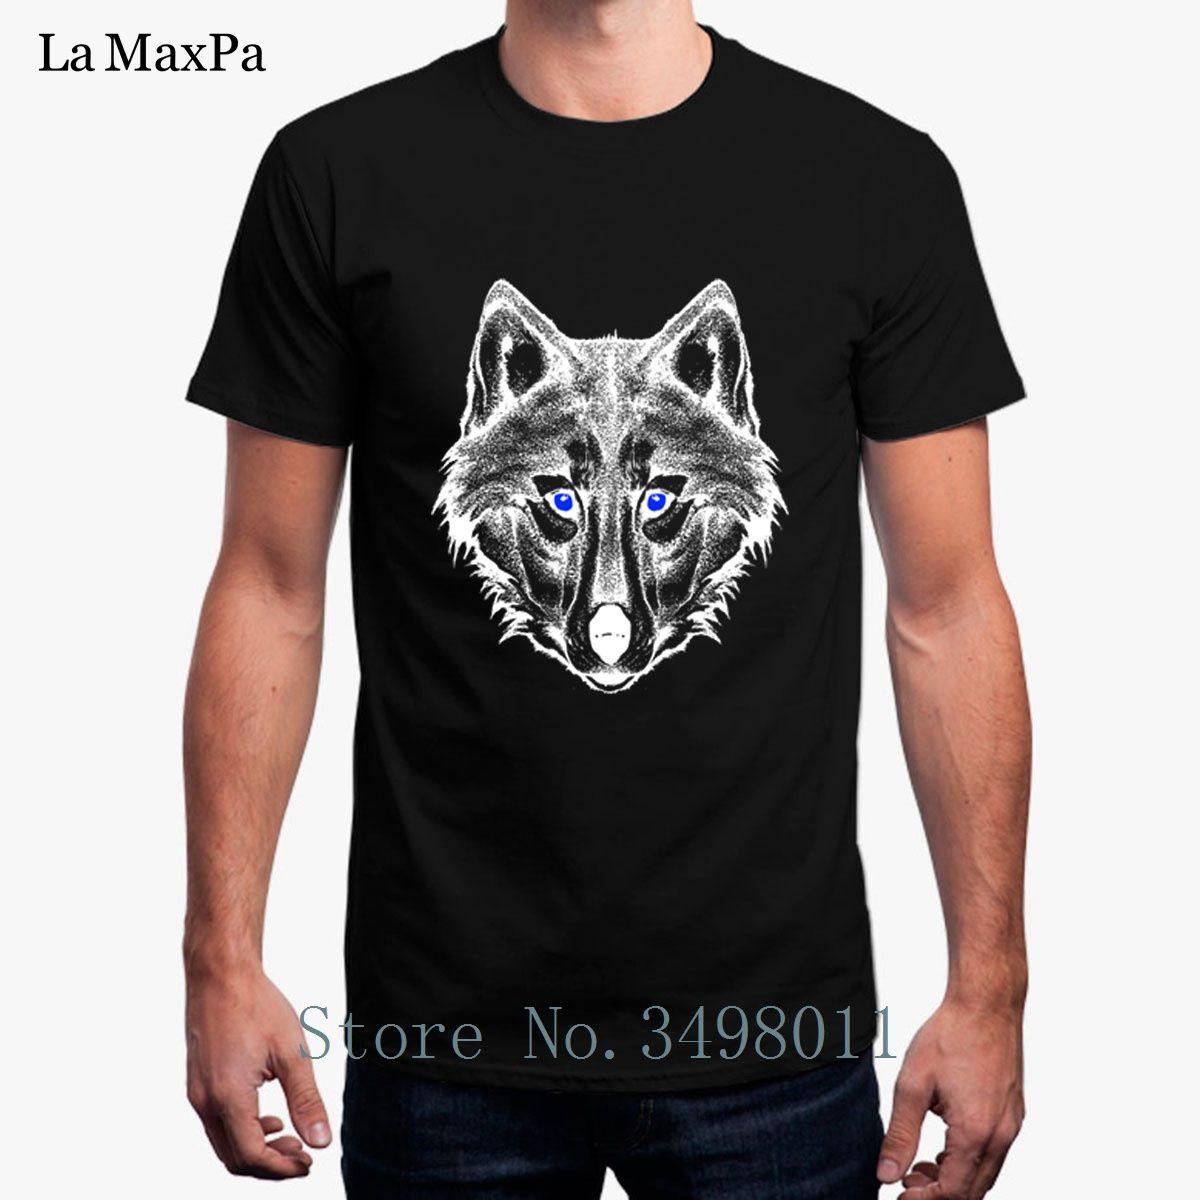 abb74a8d656b3 Top Quality Men T Shirt Savage Wolf Men S Tshirt Costume 100% Cotton Summer  2018 Homme T Shirt Man Plus Size Hip Hop T Shirt T Tee Shirts Online  Shopping ...